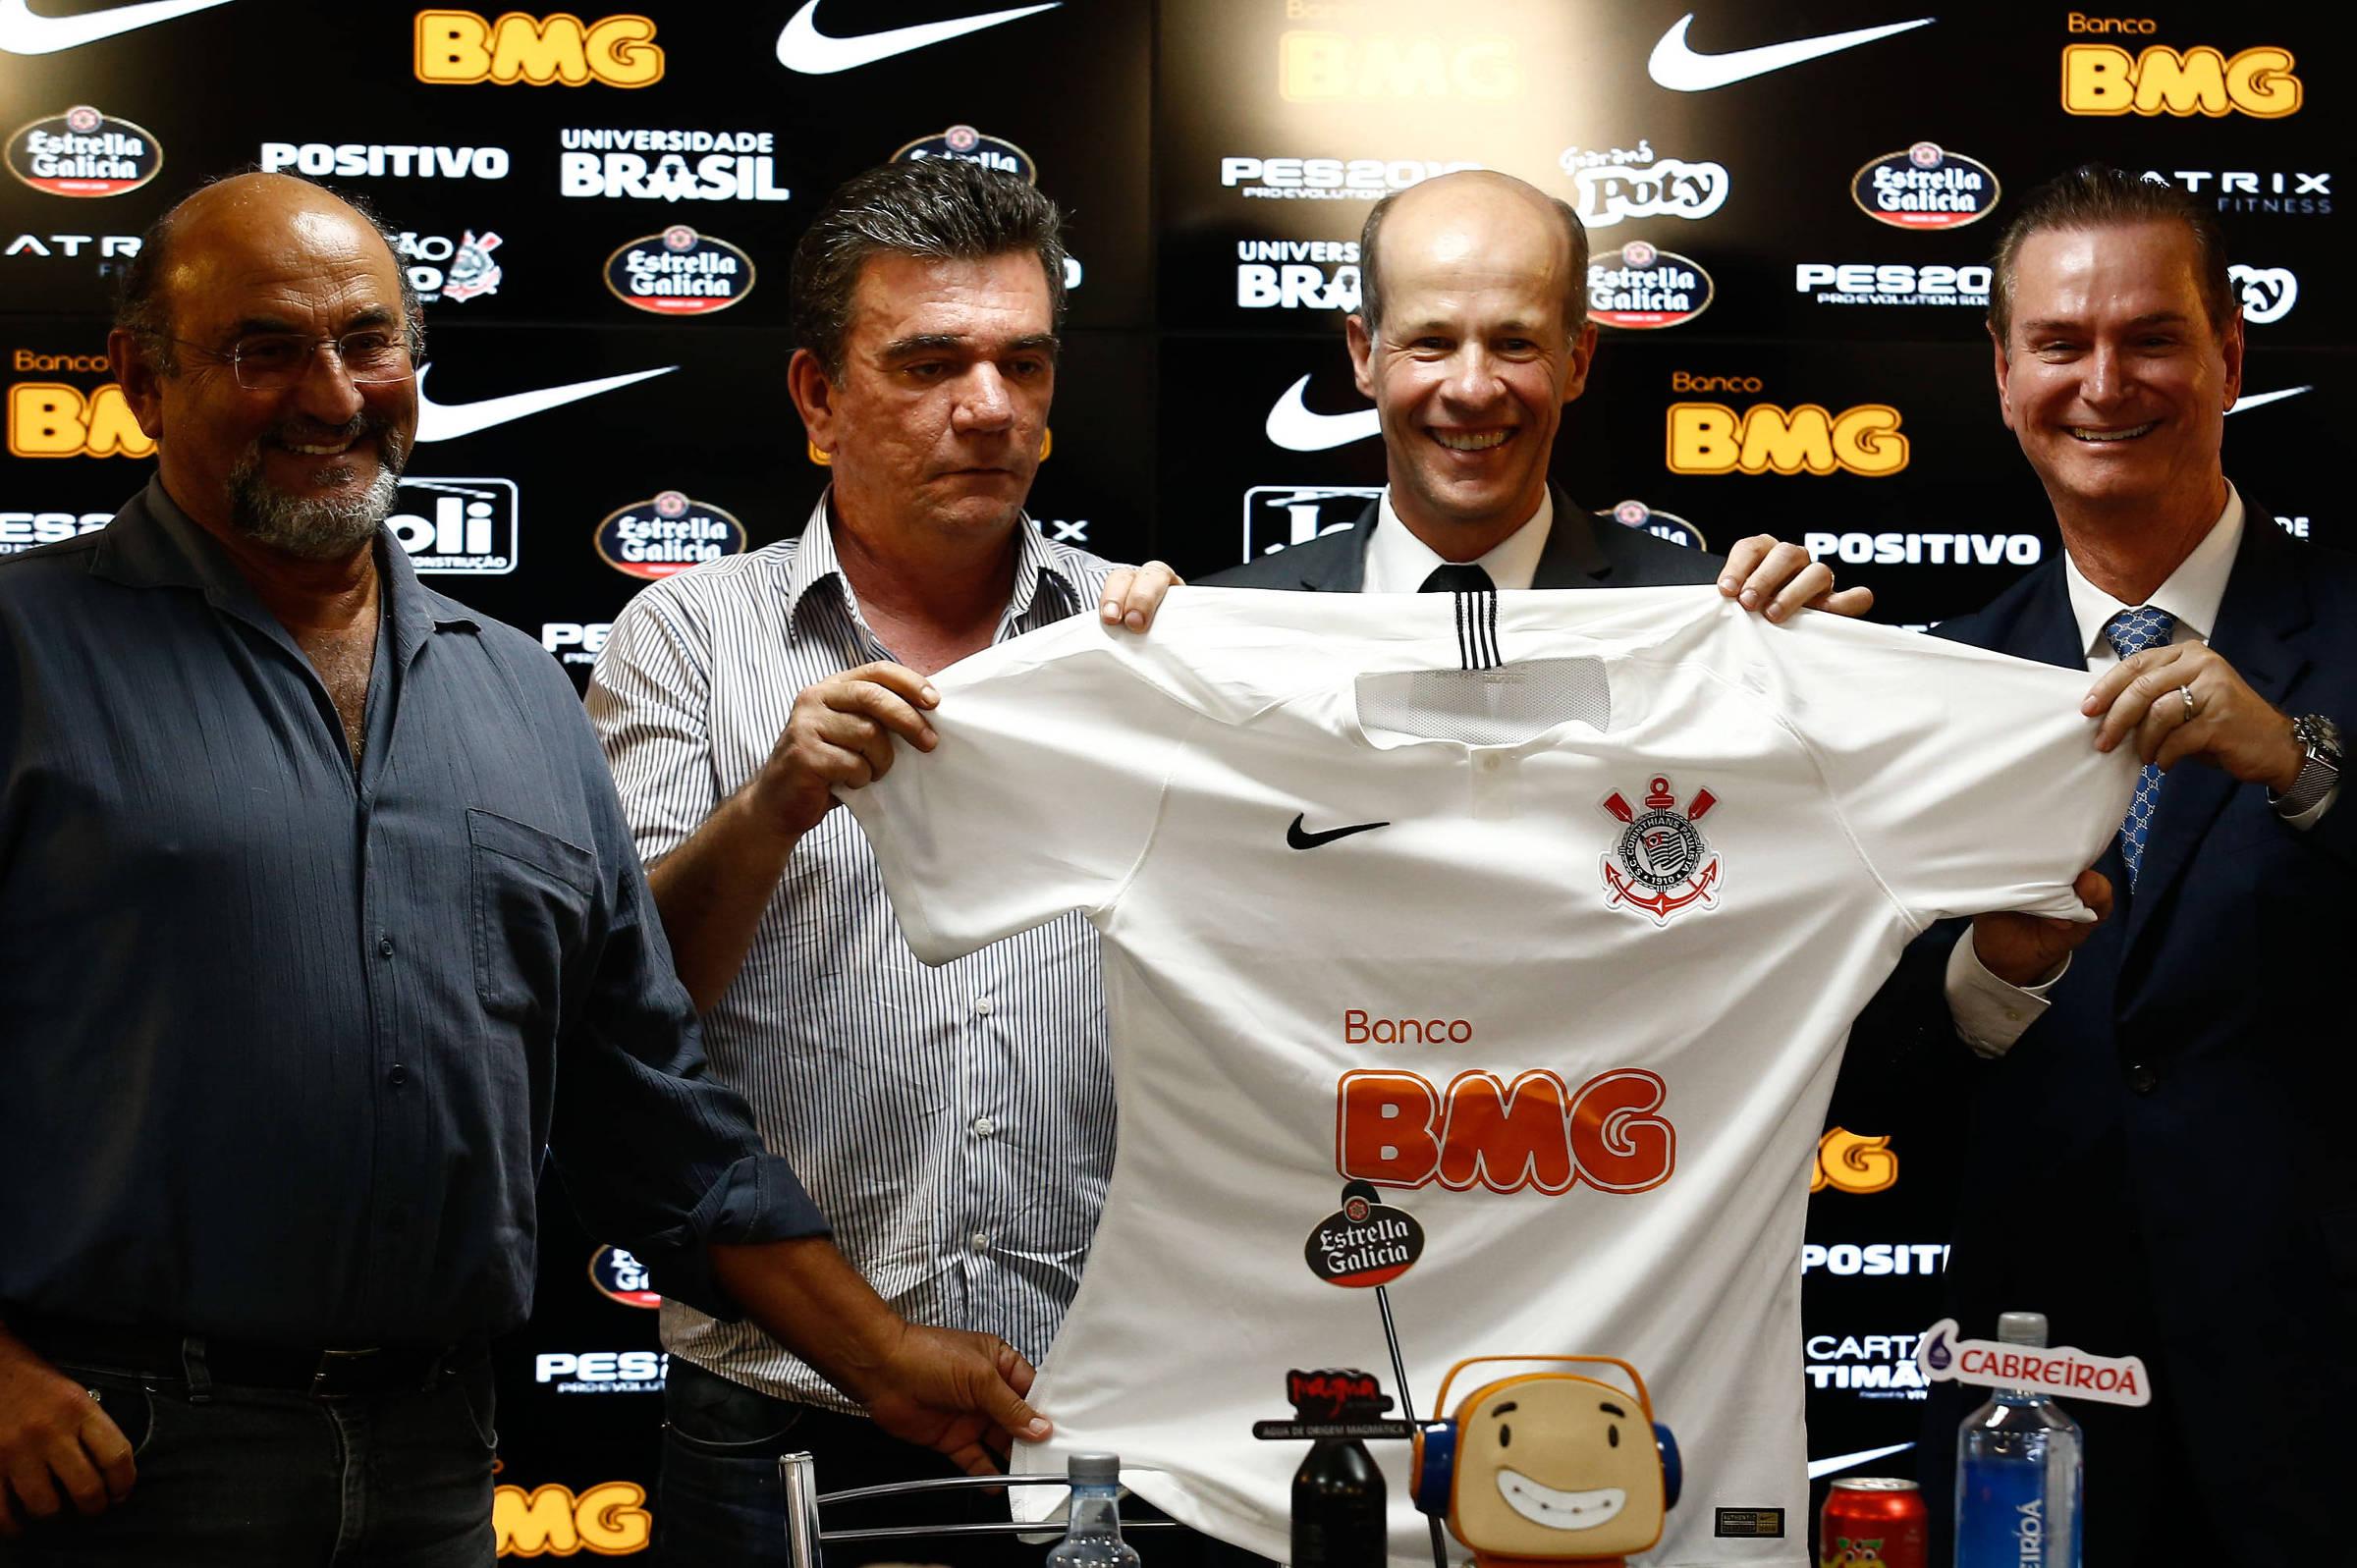 Corintiano projeta ganhar metade do que o Palmeiras recebe de patrocinador  - 01 02 2019 - Esporte - Folha 3e9393ae4517f